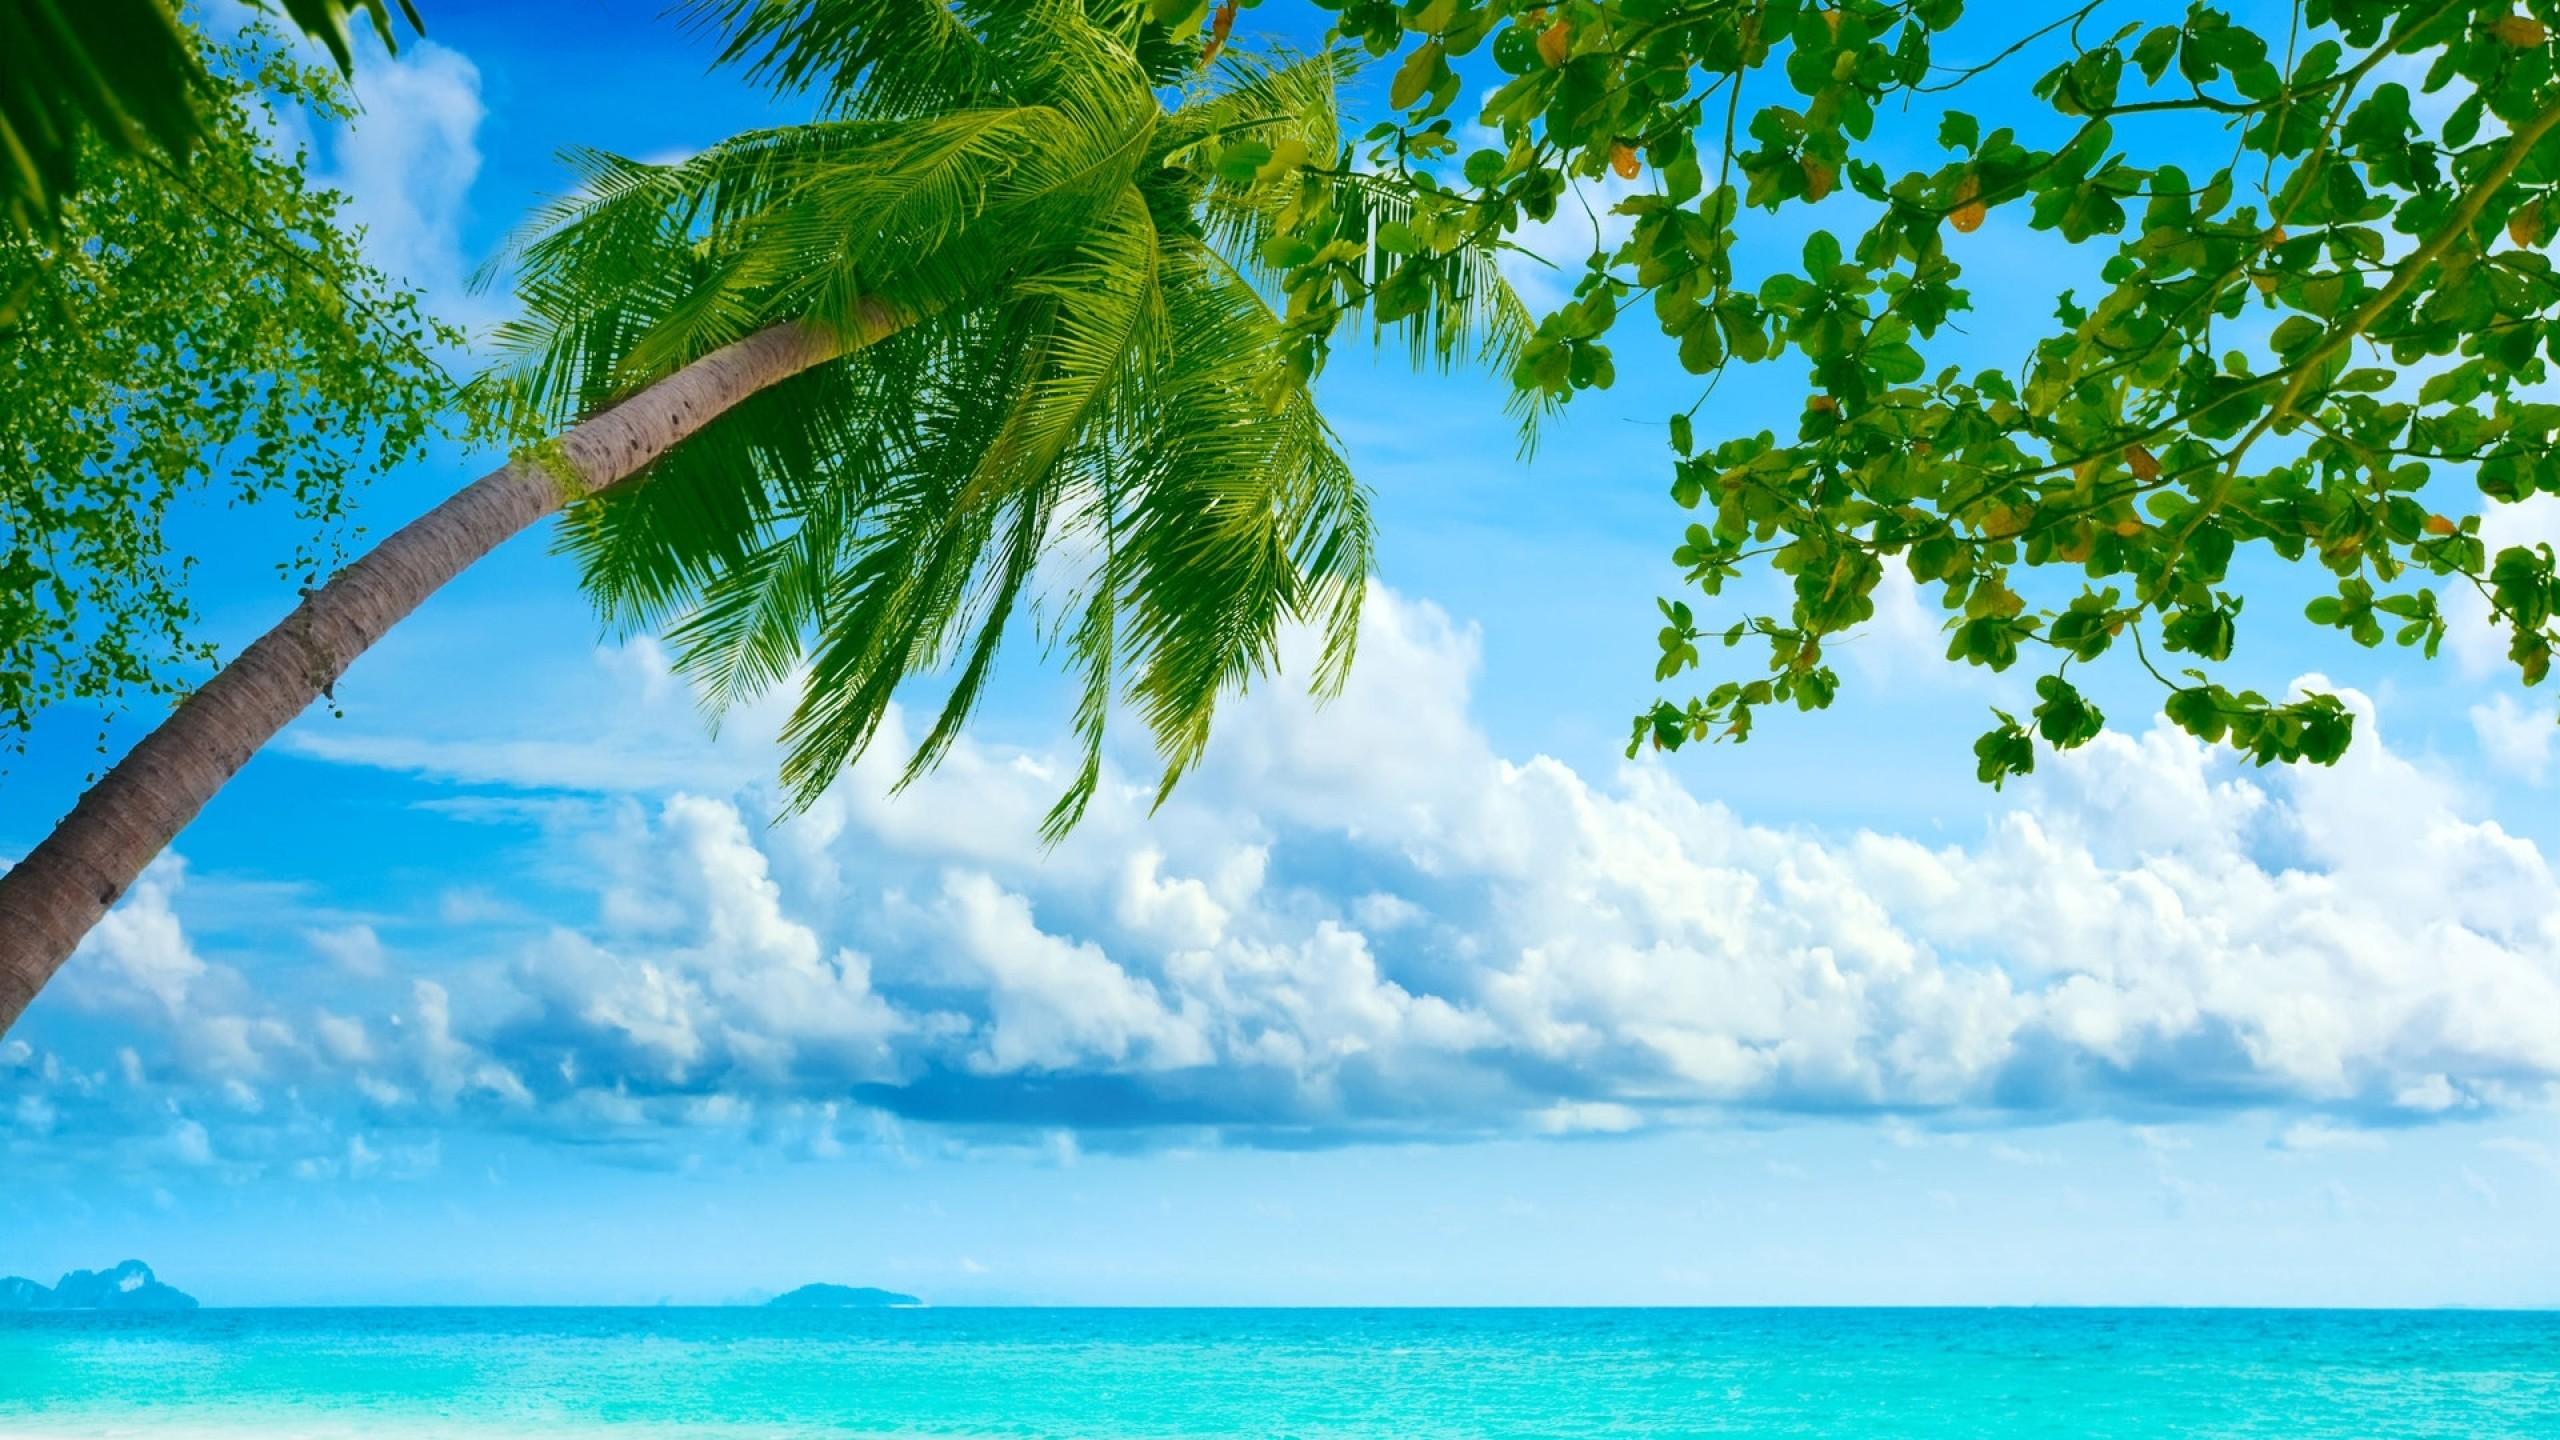 Preview wallpaper palm tree, coast, blue water, tropics, resort, relax,